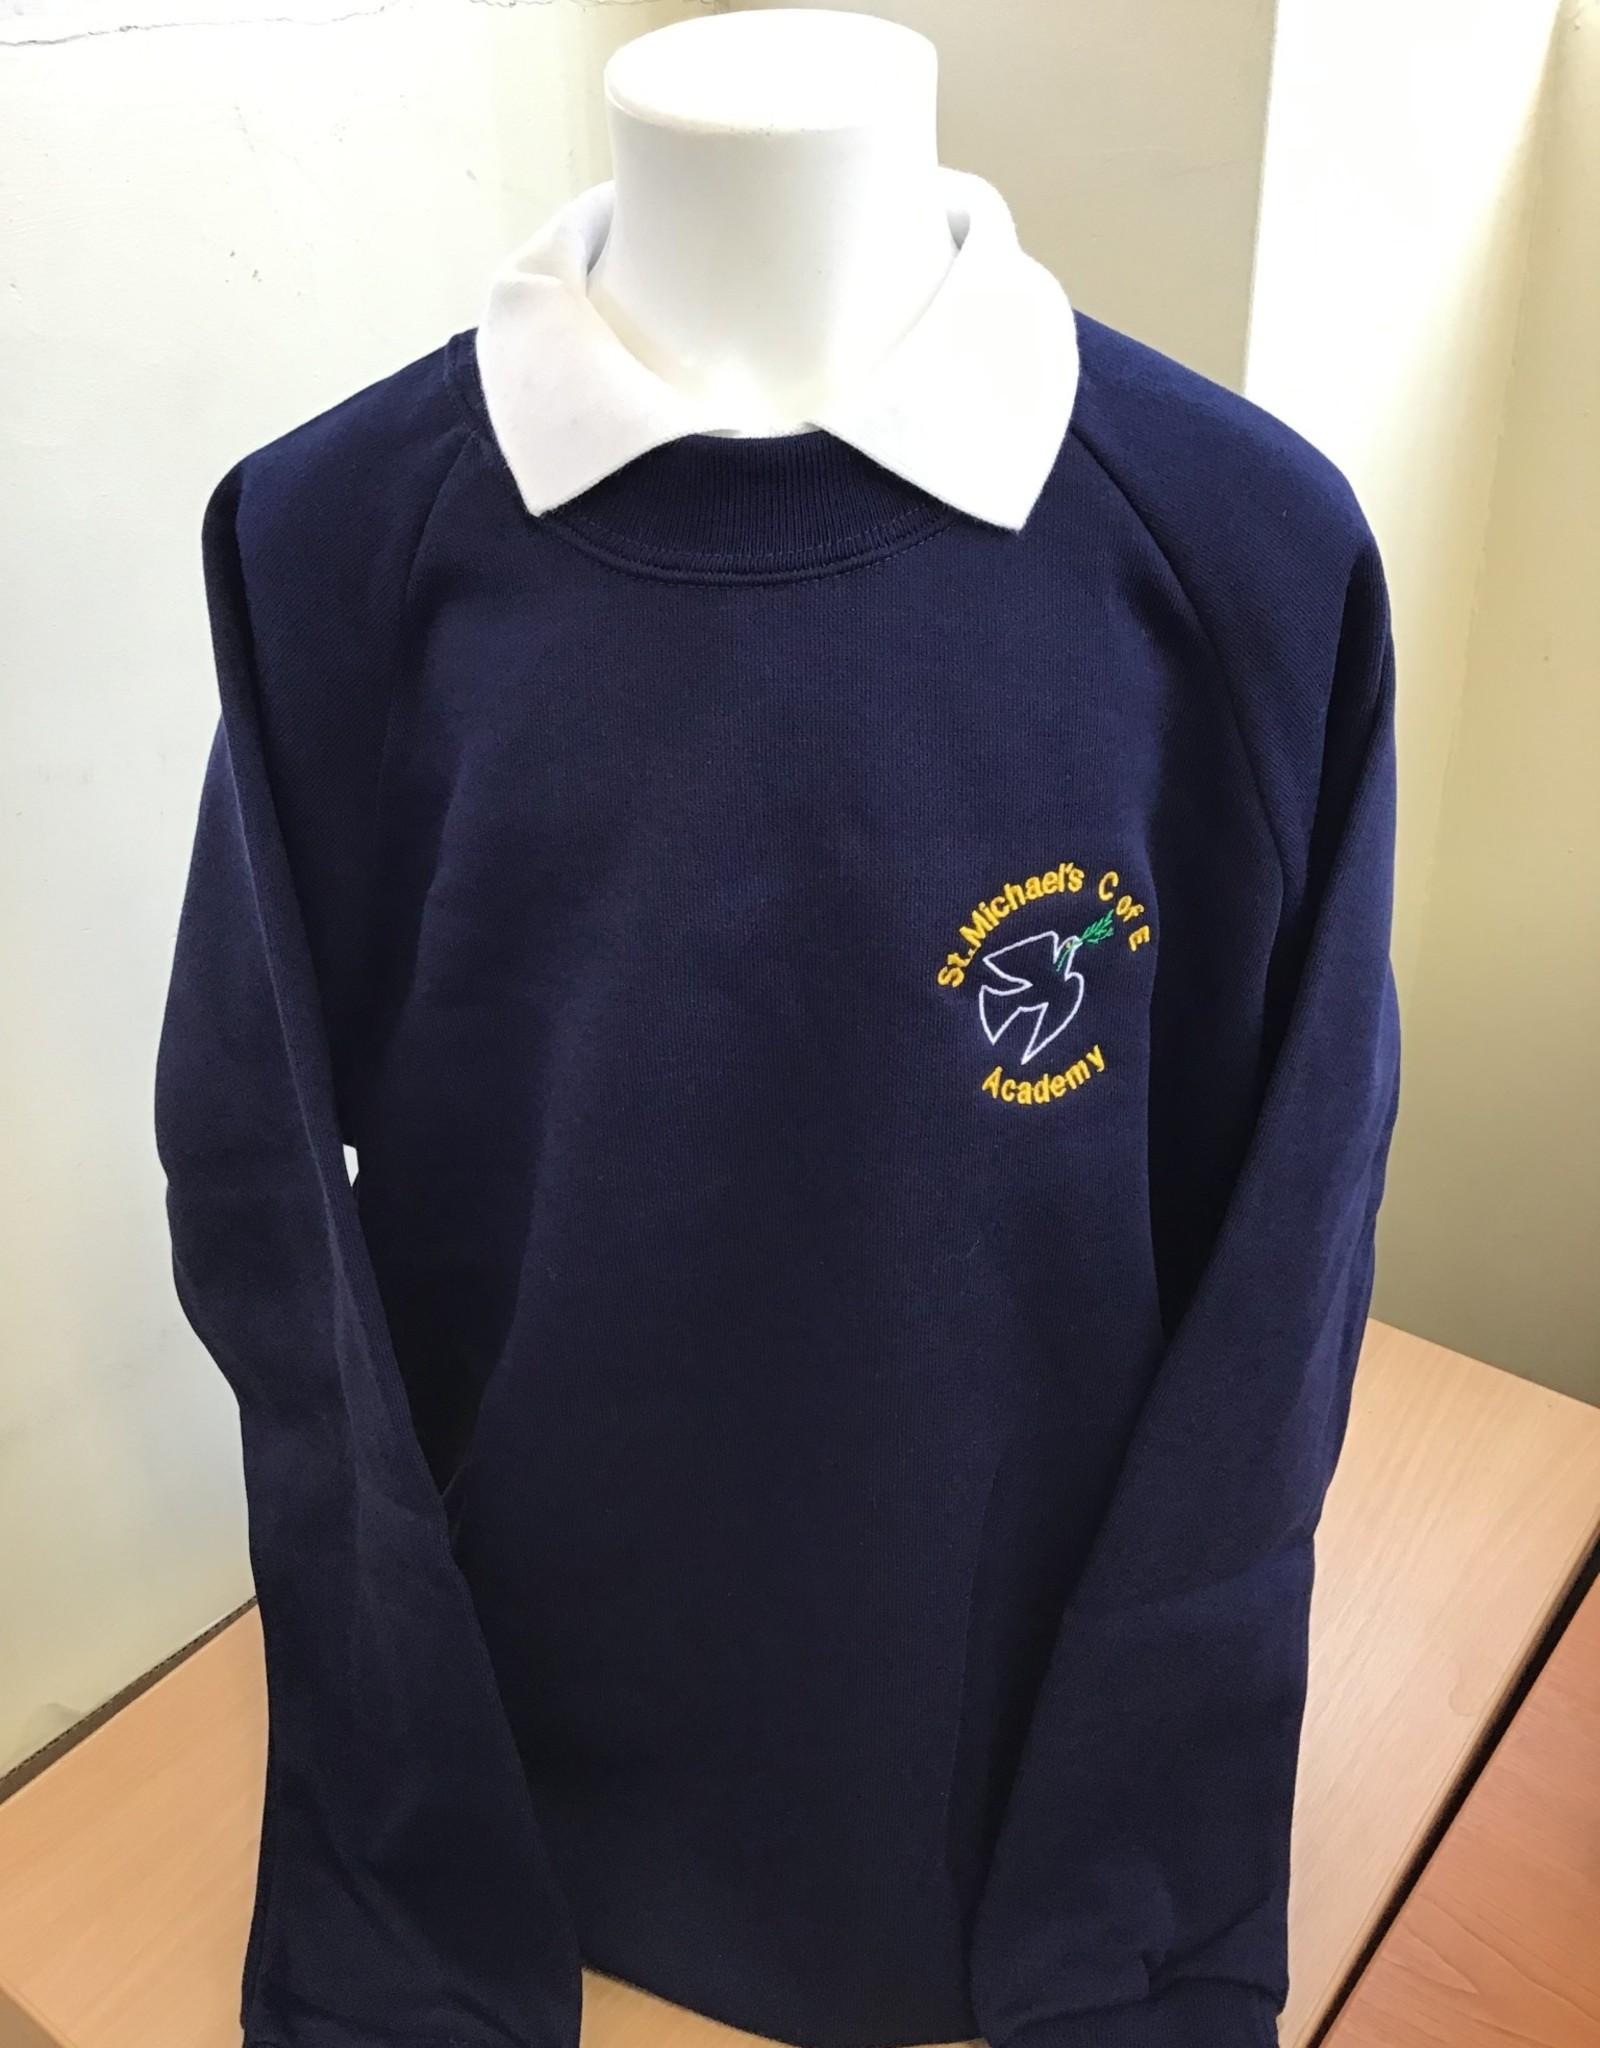 Sweatshirt Child Size - St Michaels CE Academy